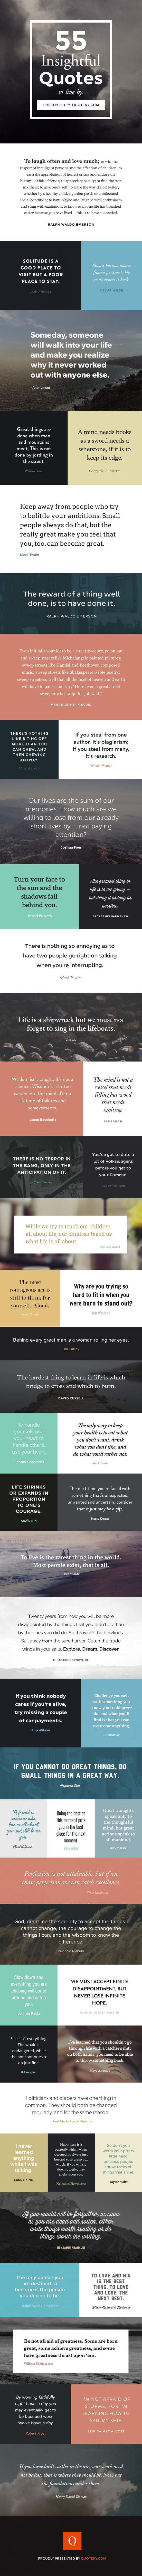 Insightful-Quotes